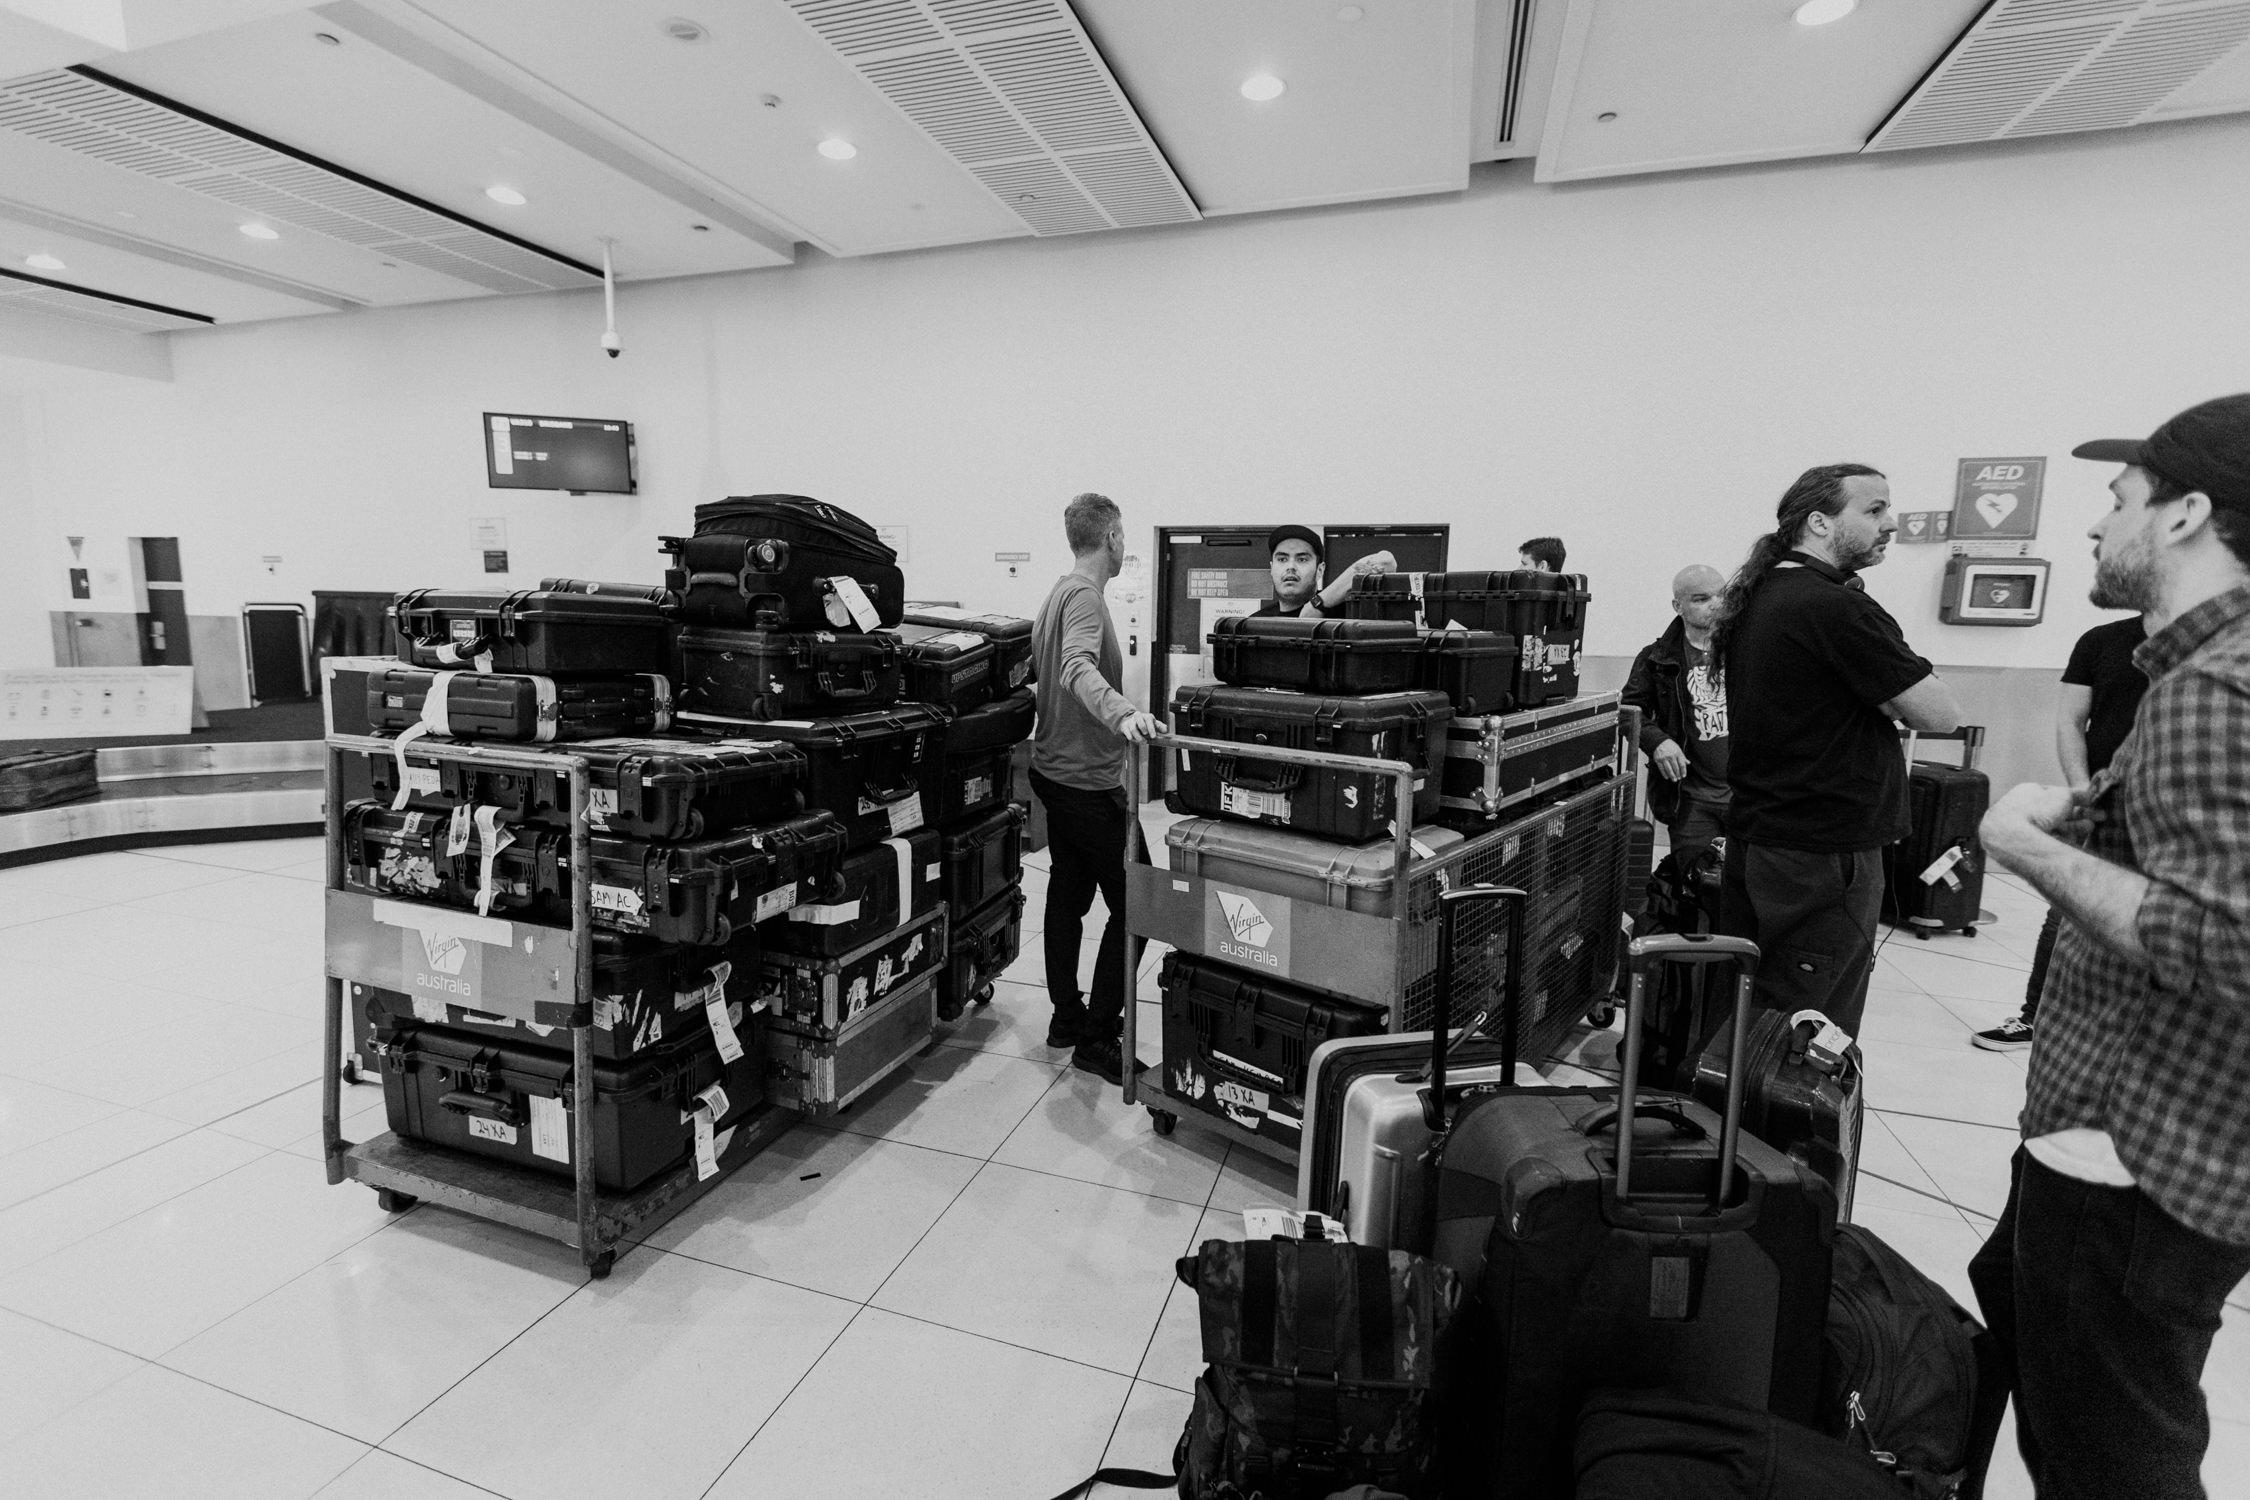 x-ambassadors-crew-airport-tour-cases-AnnaLeeMedia